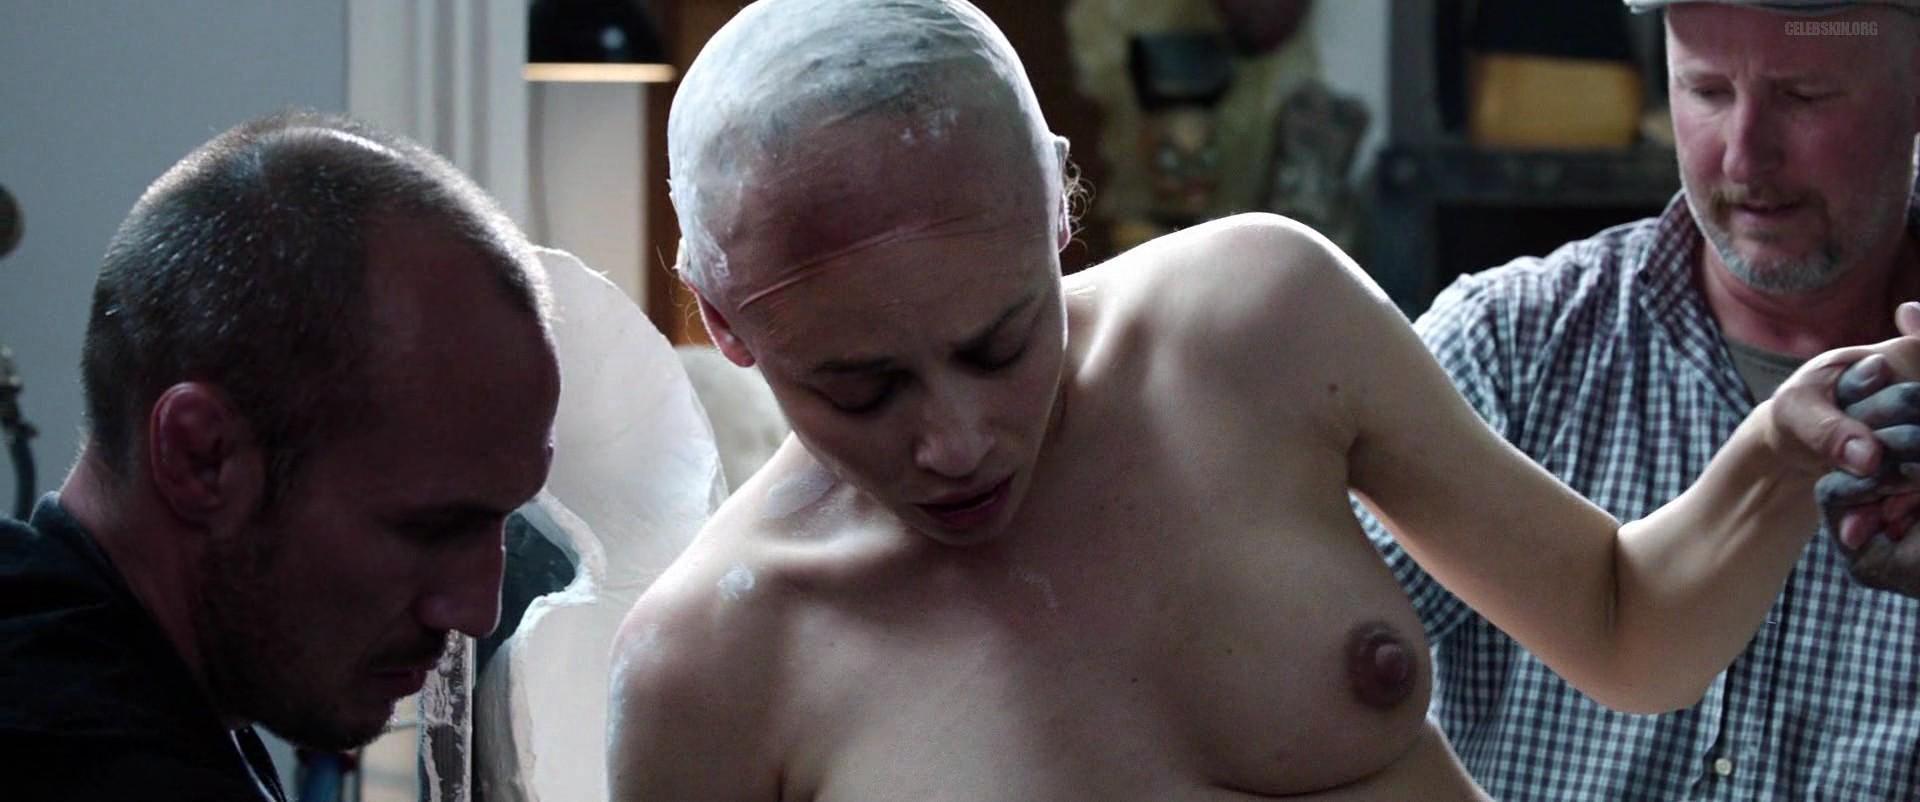 Wife dressed undressed nude